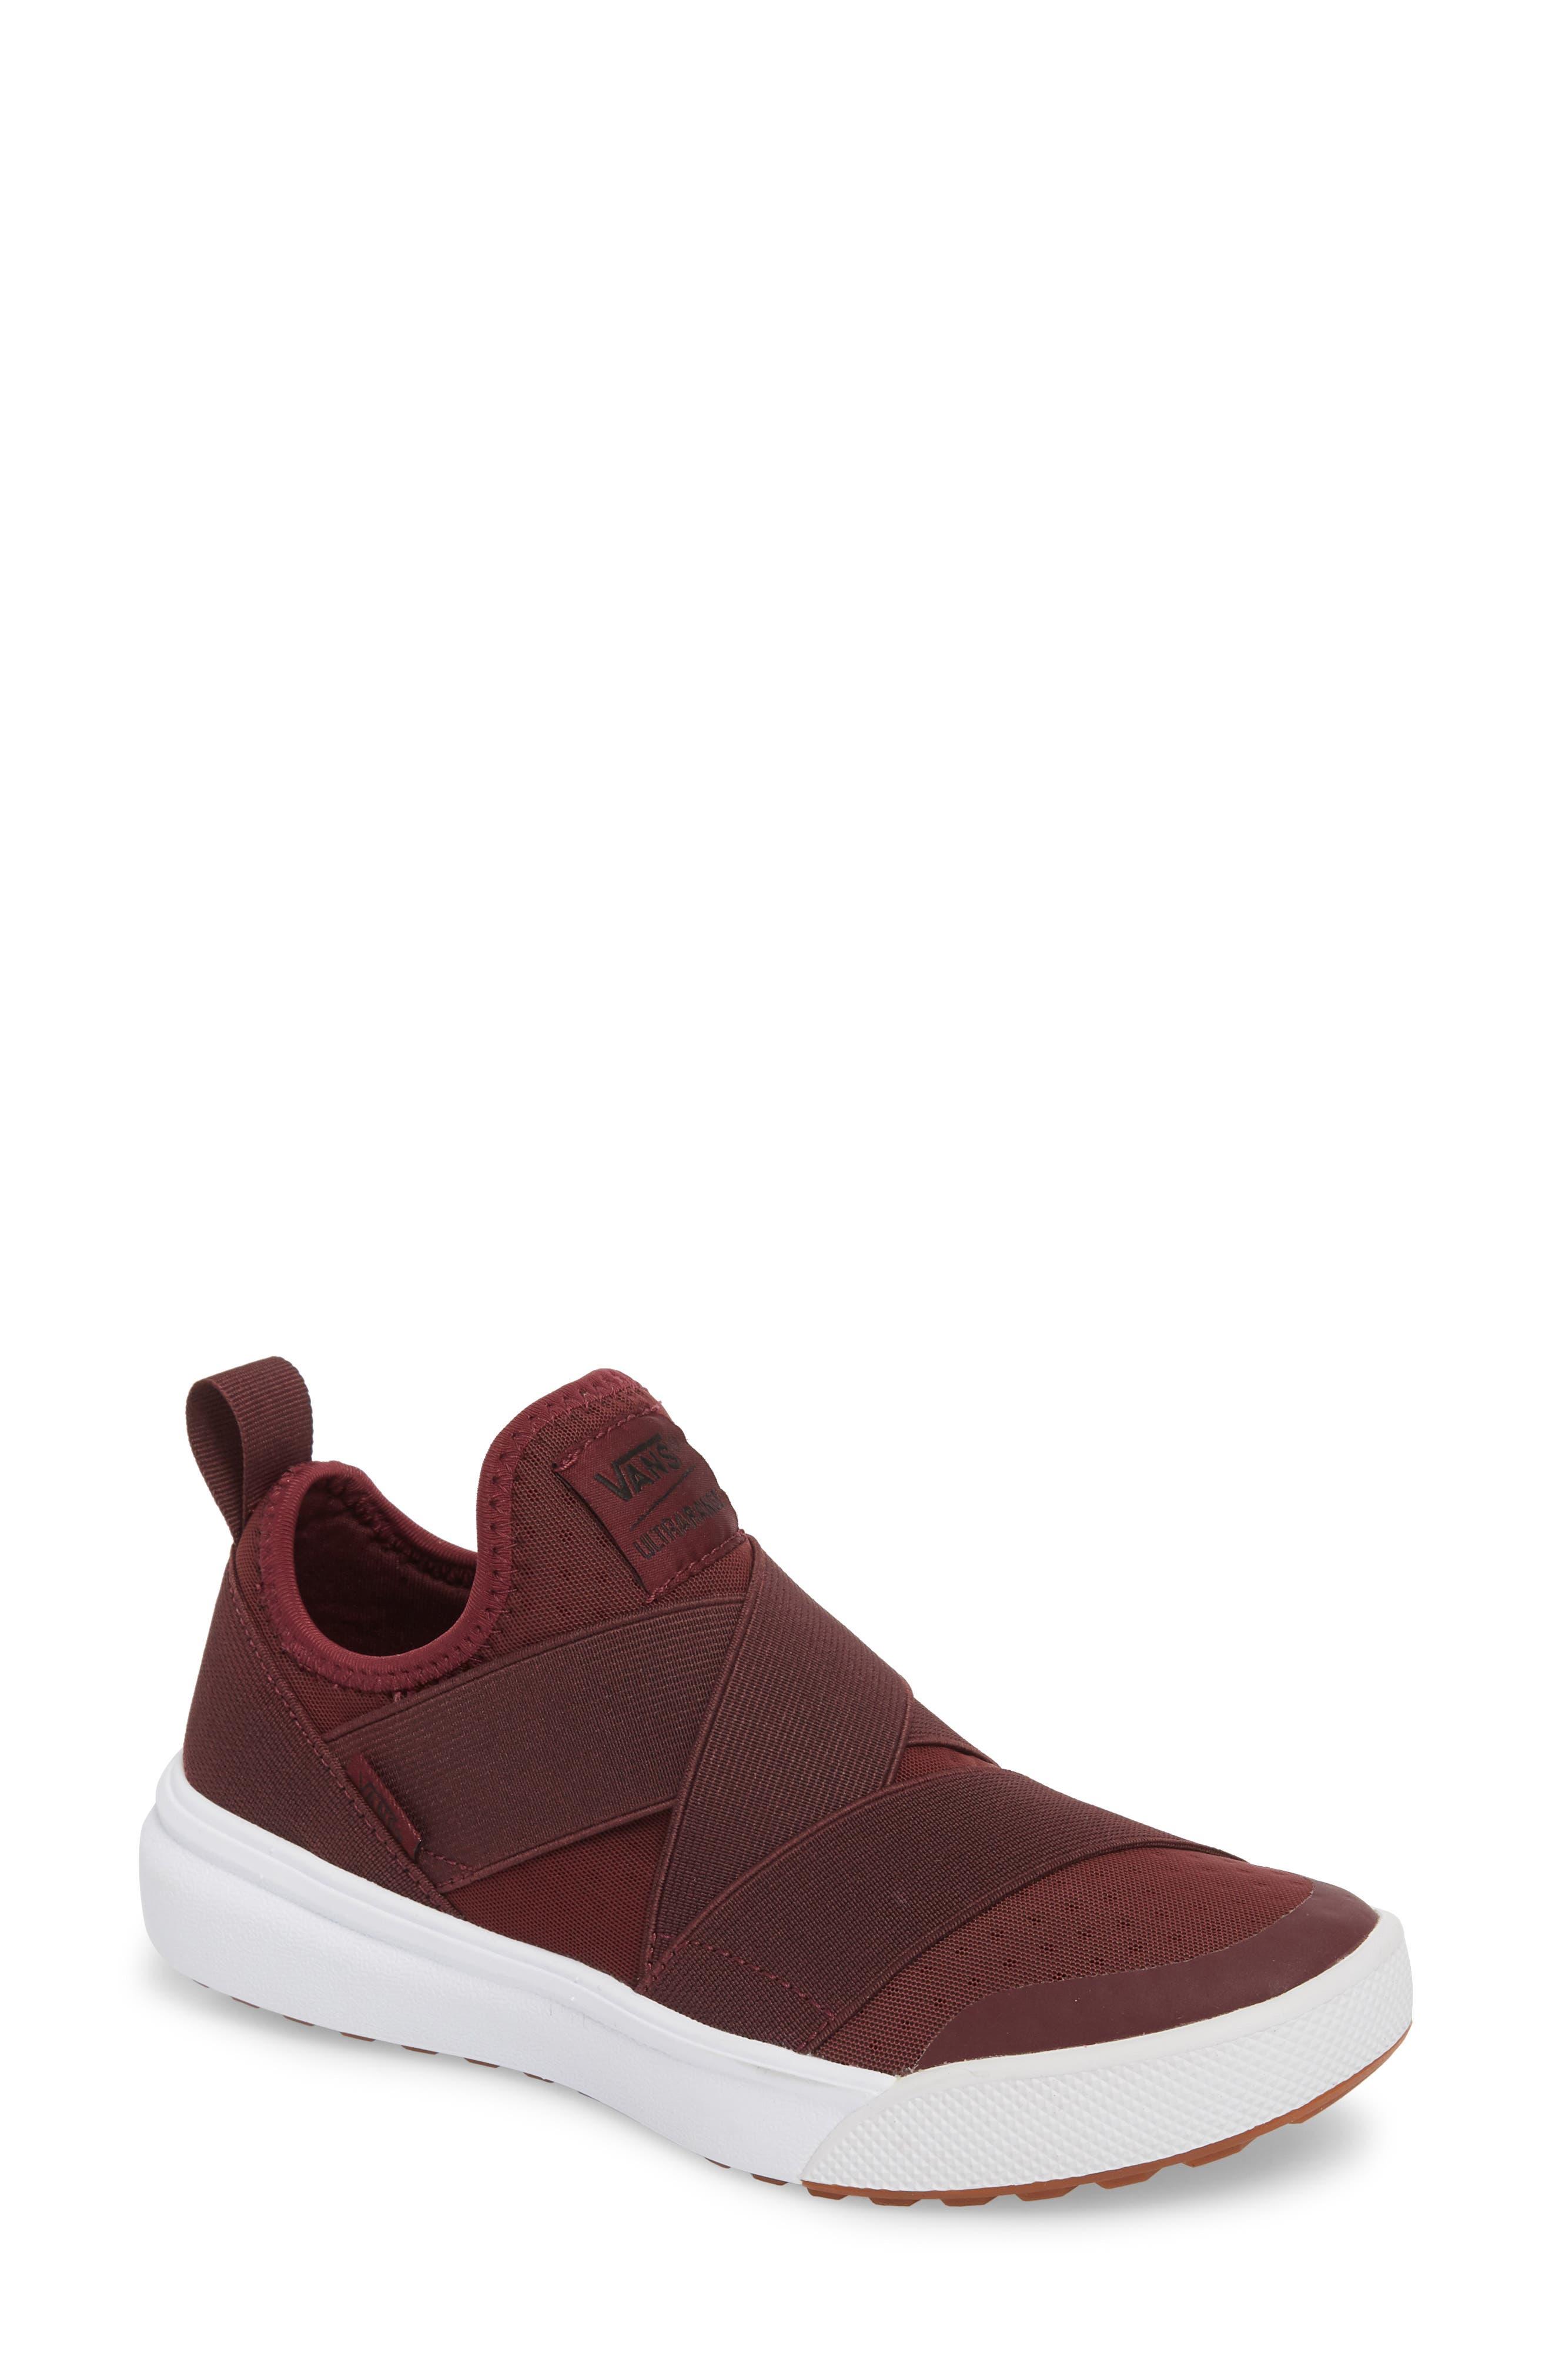 UltraRange Gore Slip-On Sneaker,                             Main thumbnail 1, color,                             Port Royale